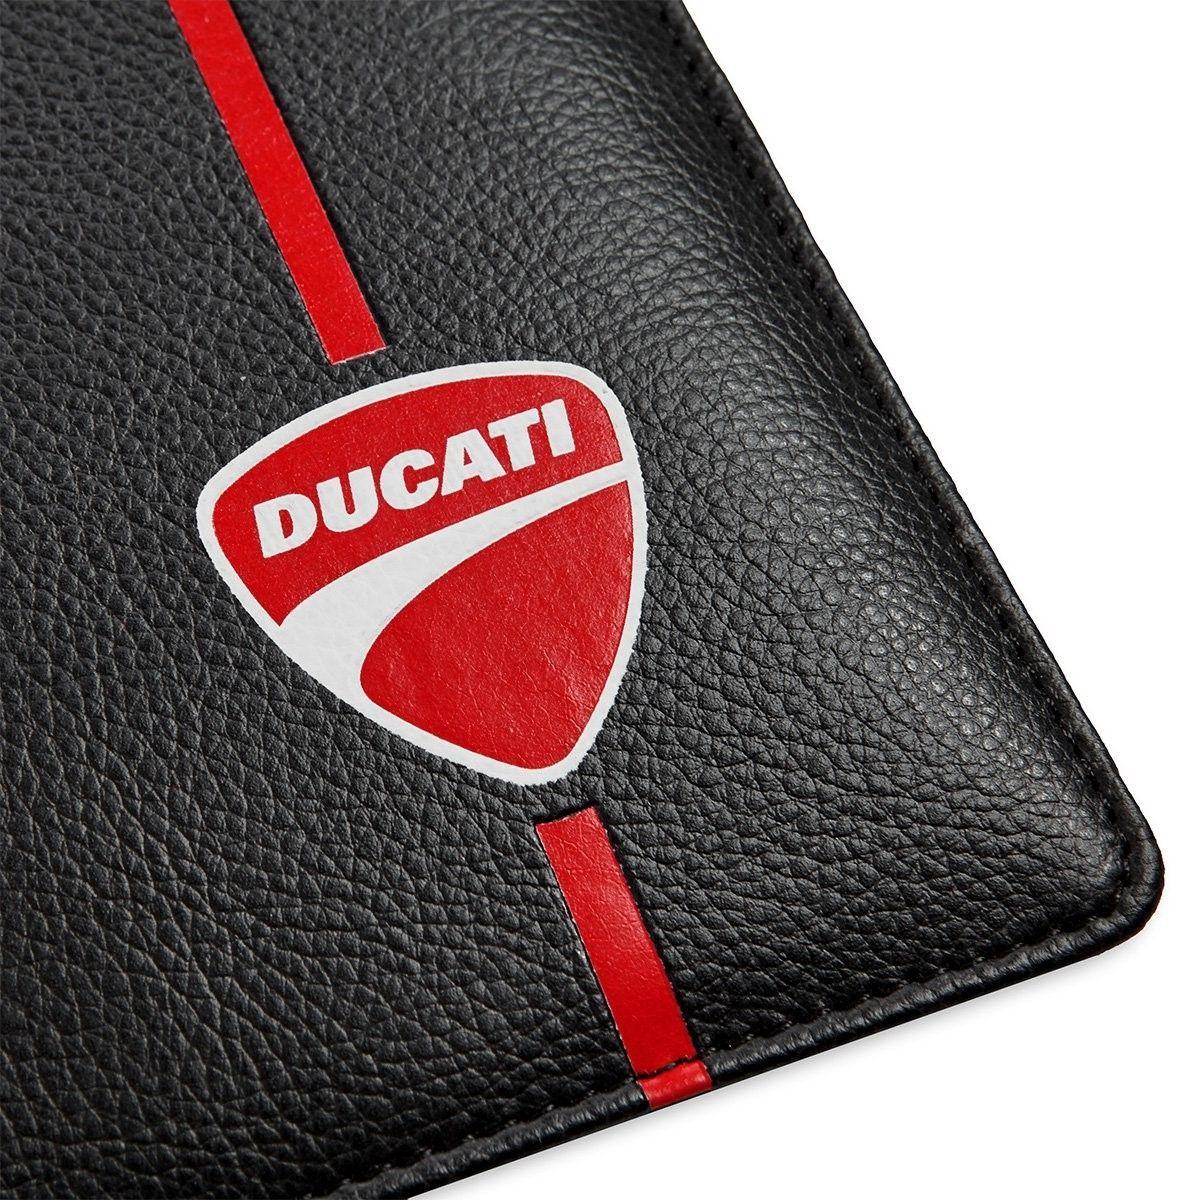 【DUCATI performance】Ducati iPad 保護套 - 「Webike-摩托百貨」